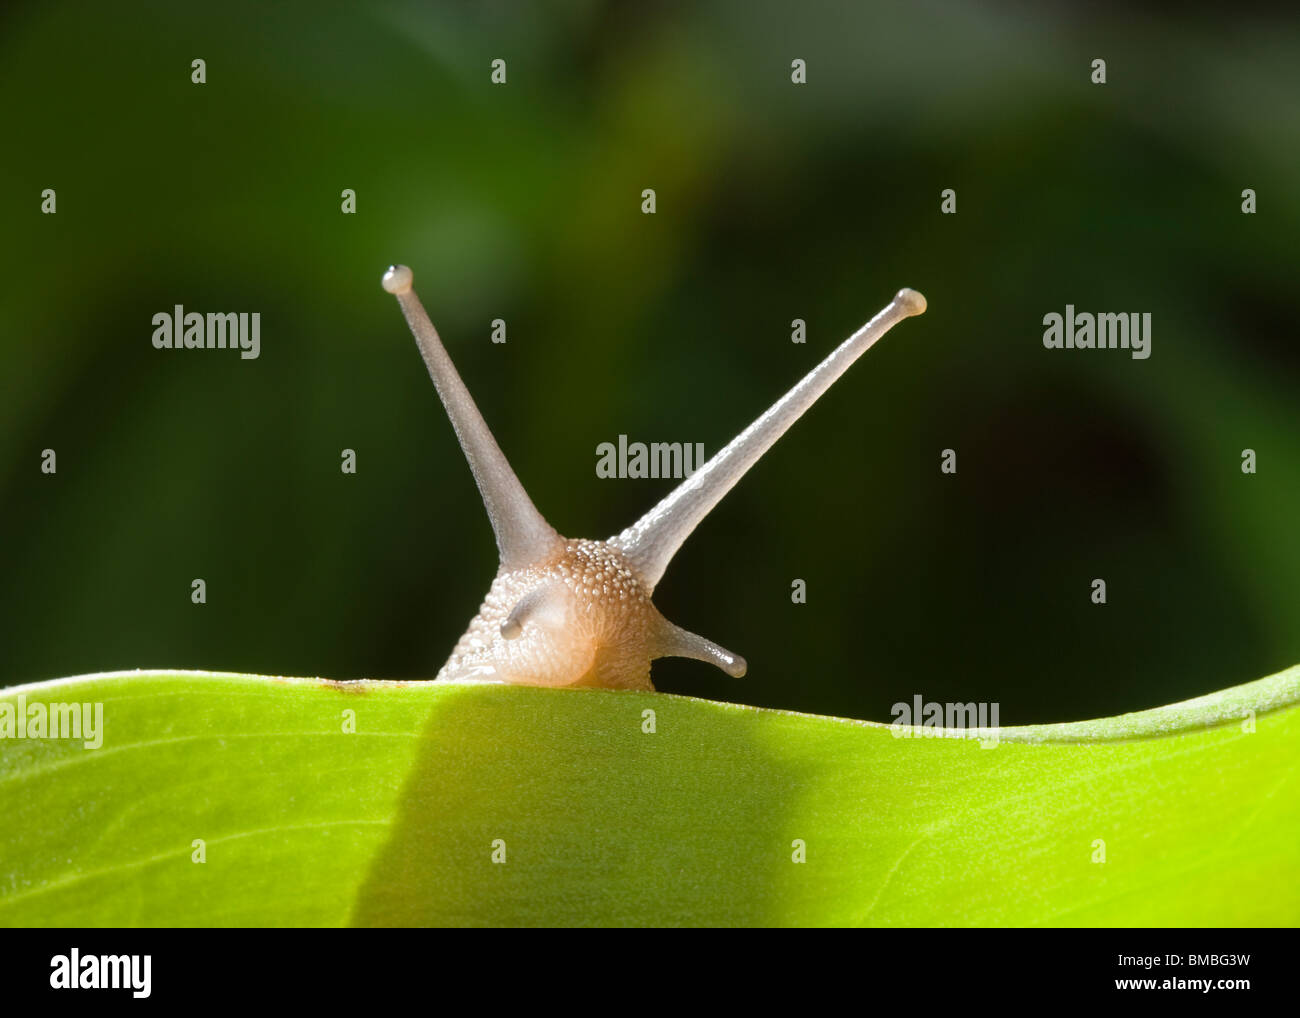 Garden snail, Helix aspersa. Stock Photo